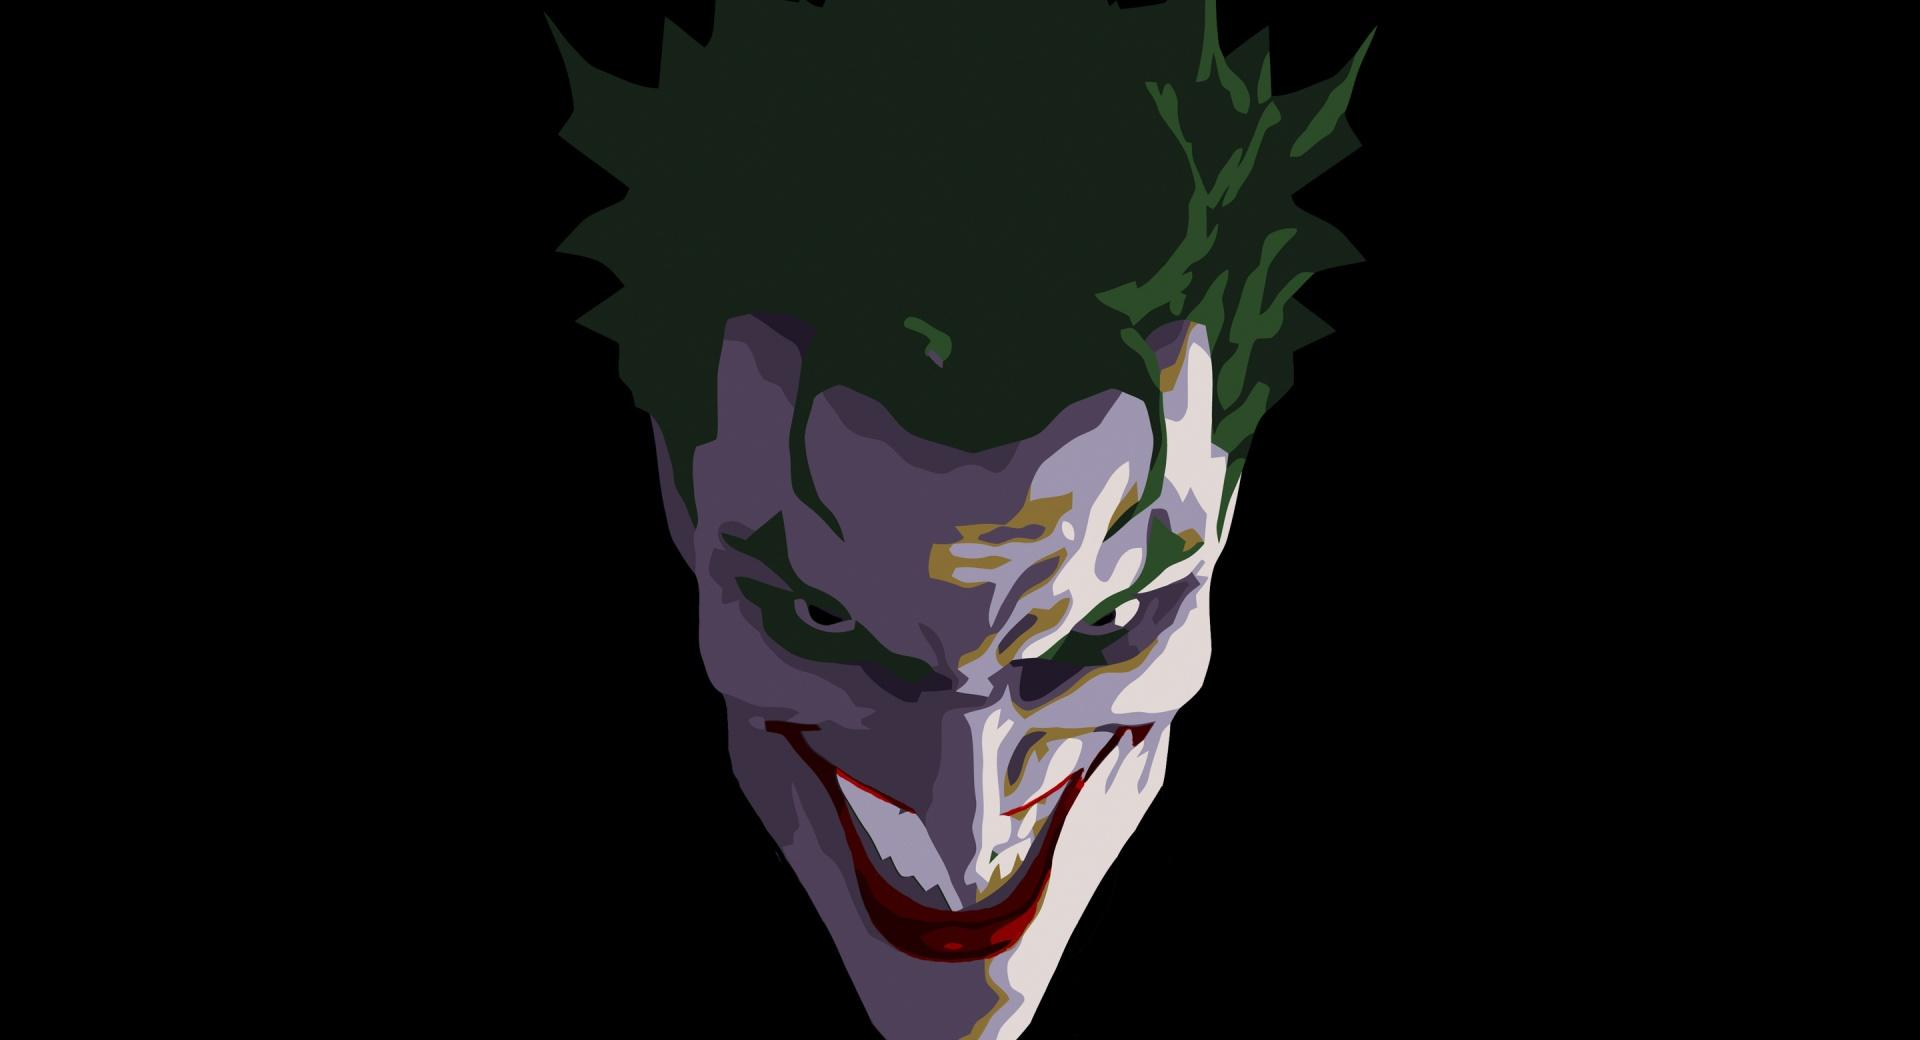 Joker Face wallpapers HD quality